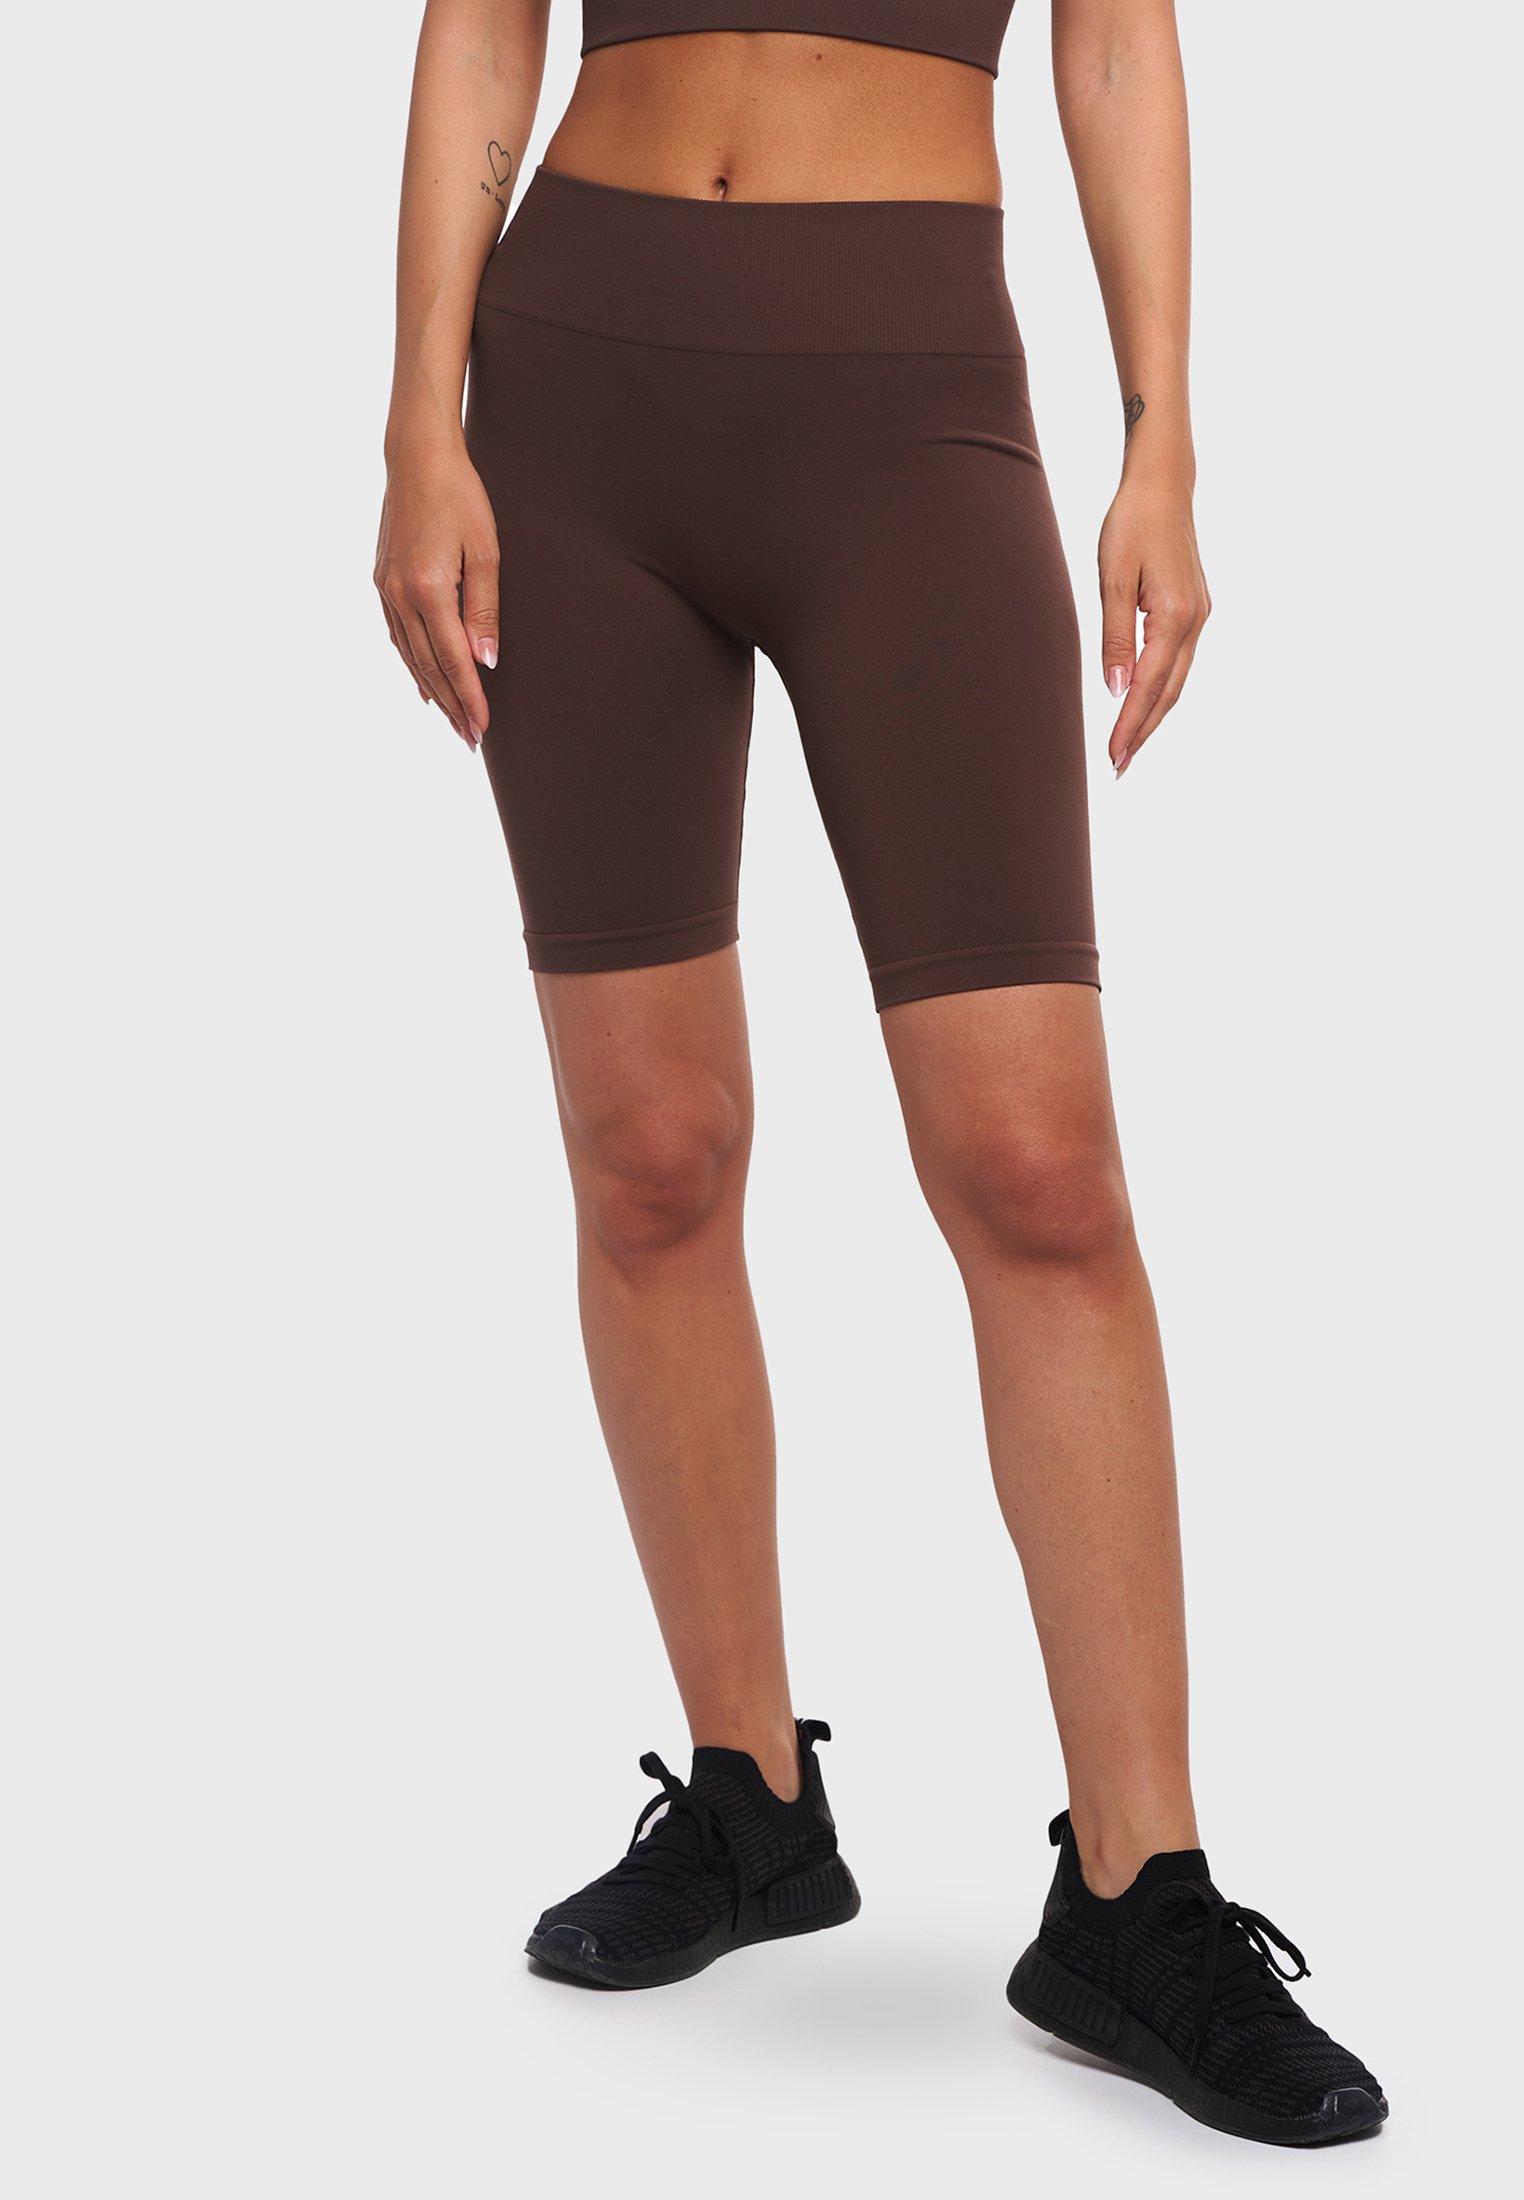 Femme LEN ONE BLOCK - Pantalon 3/4 de sport